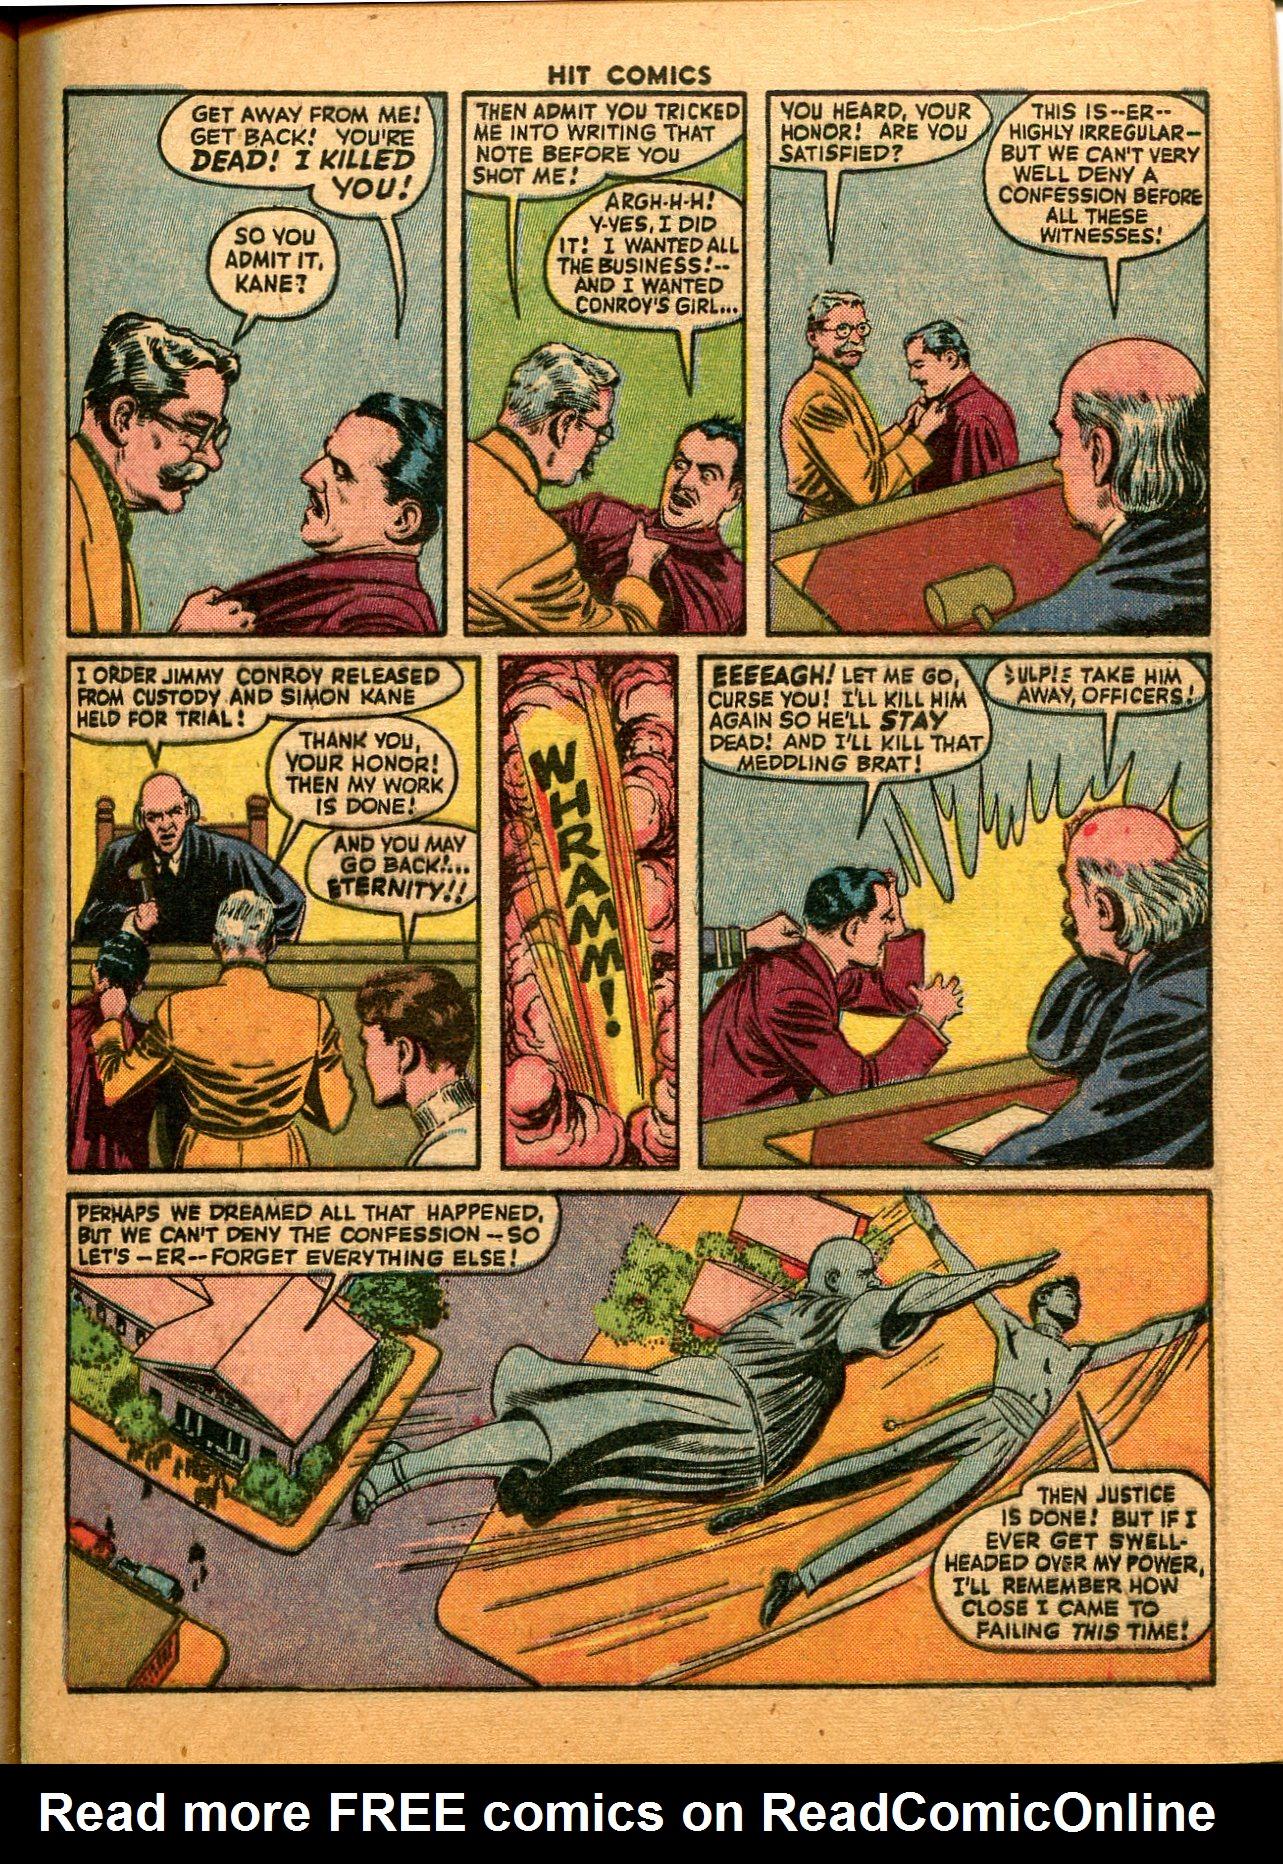 Read online Hit Comics comic -  Issue #35 - 17